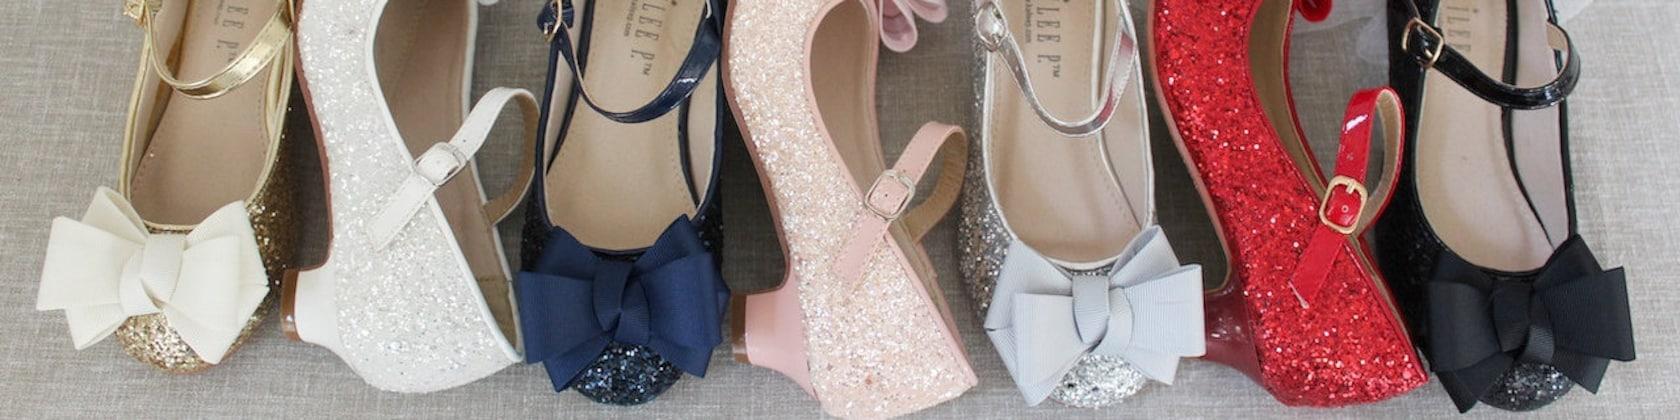 Seychelles Everybody Dance Peach Kitten Heels | Peach shoes